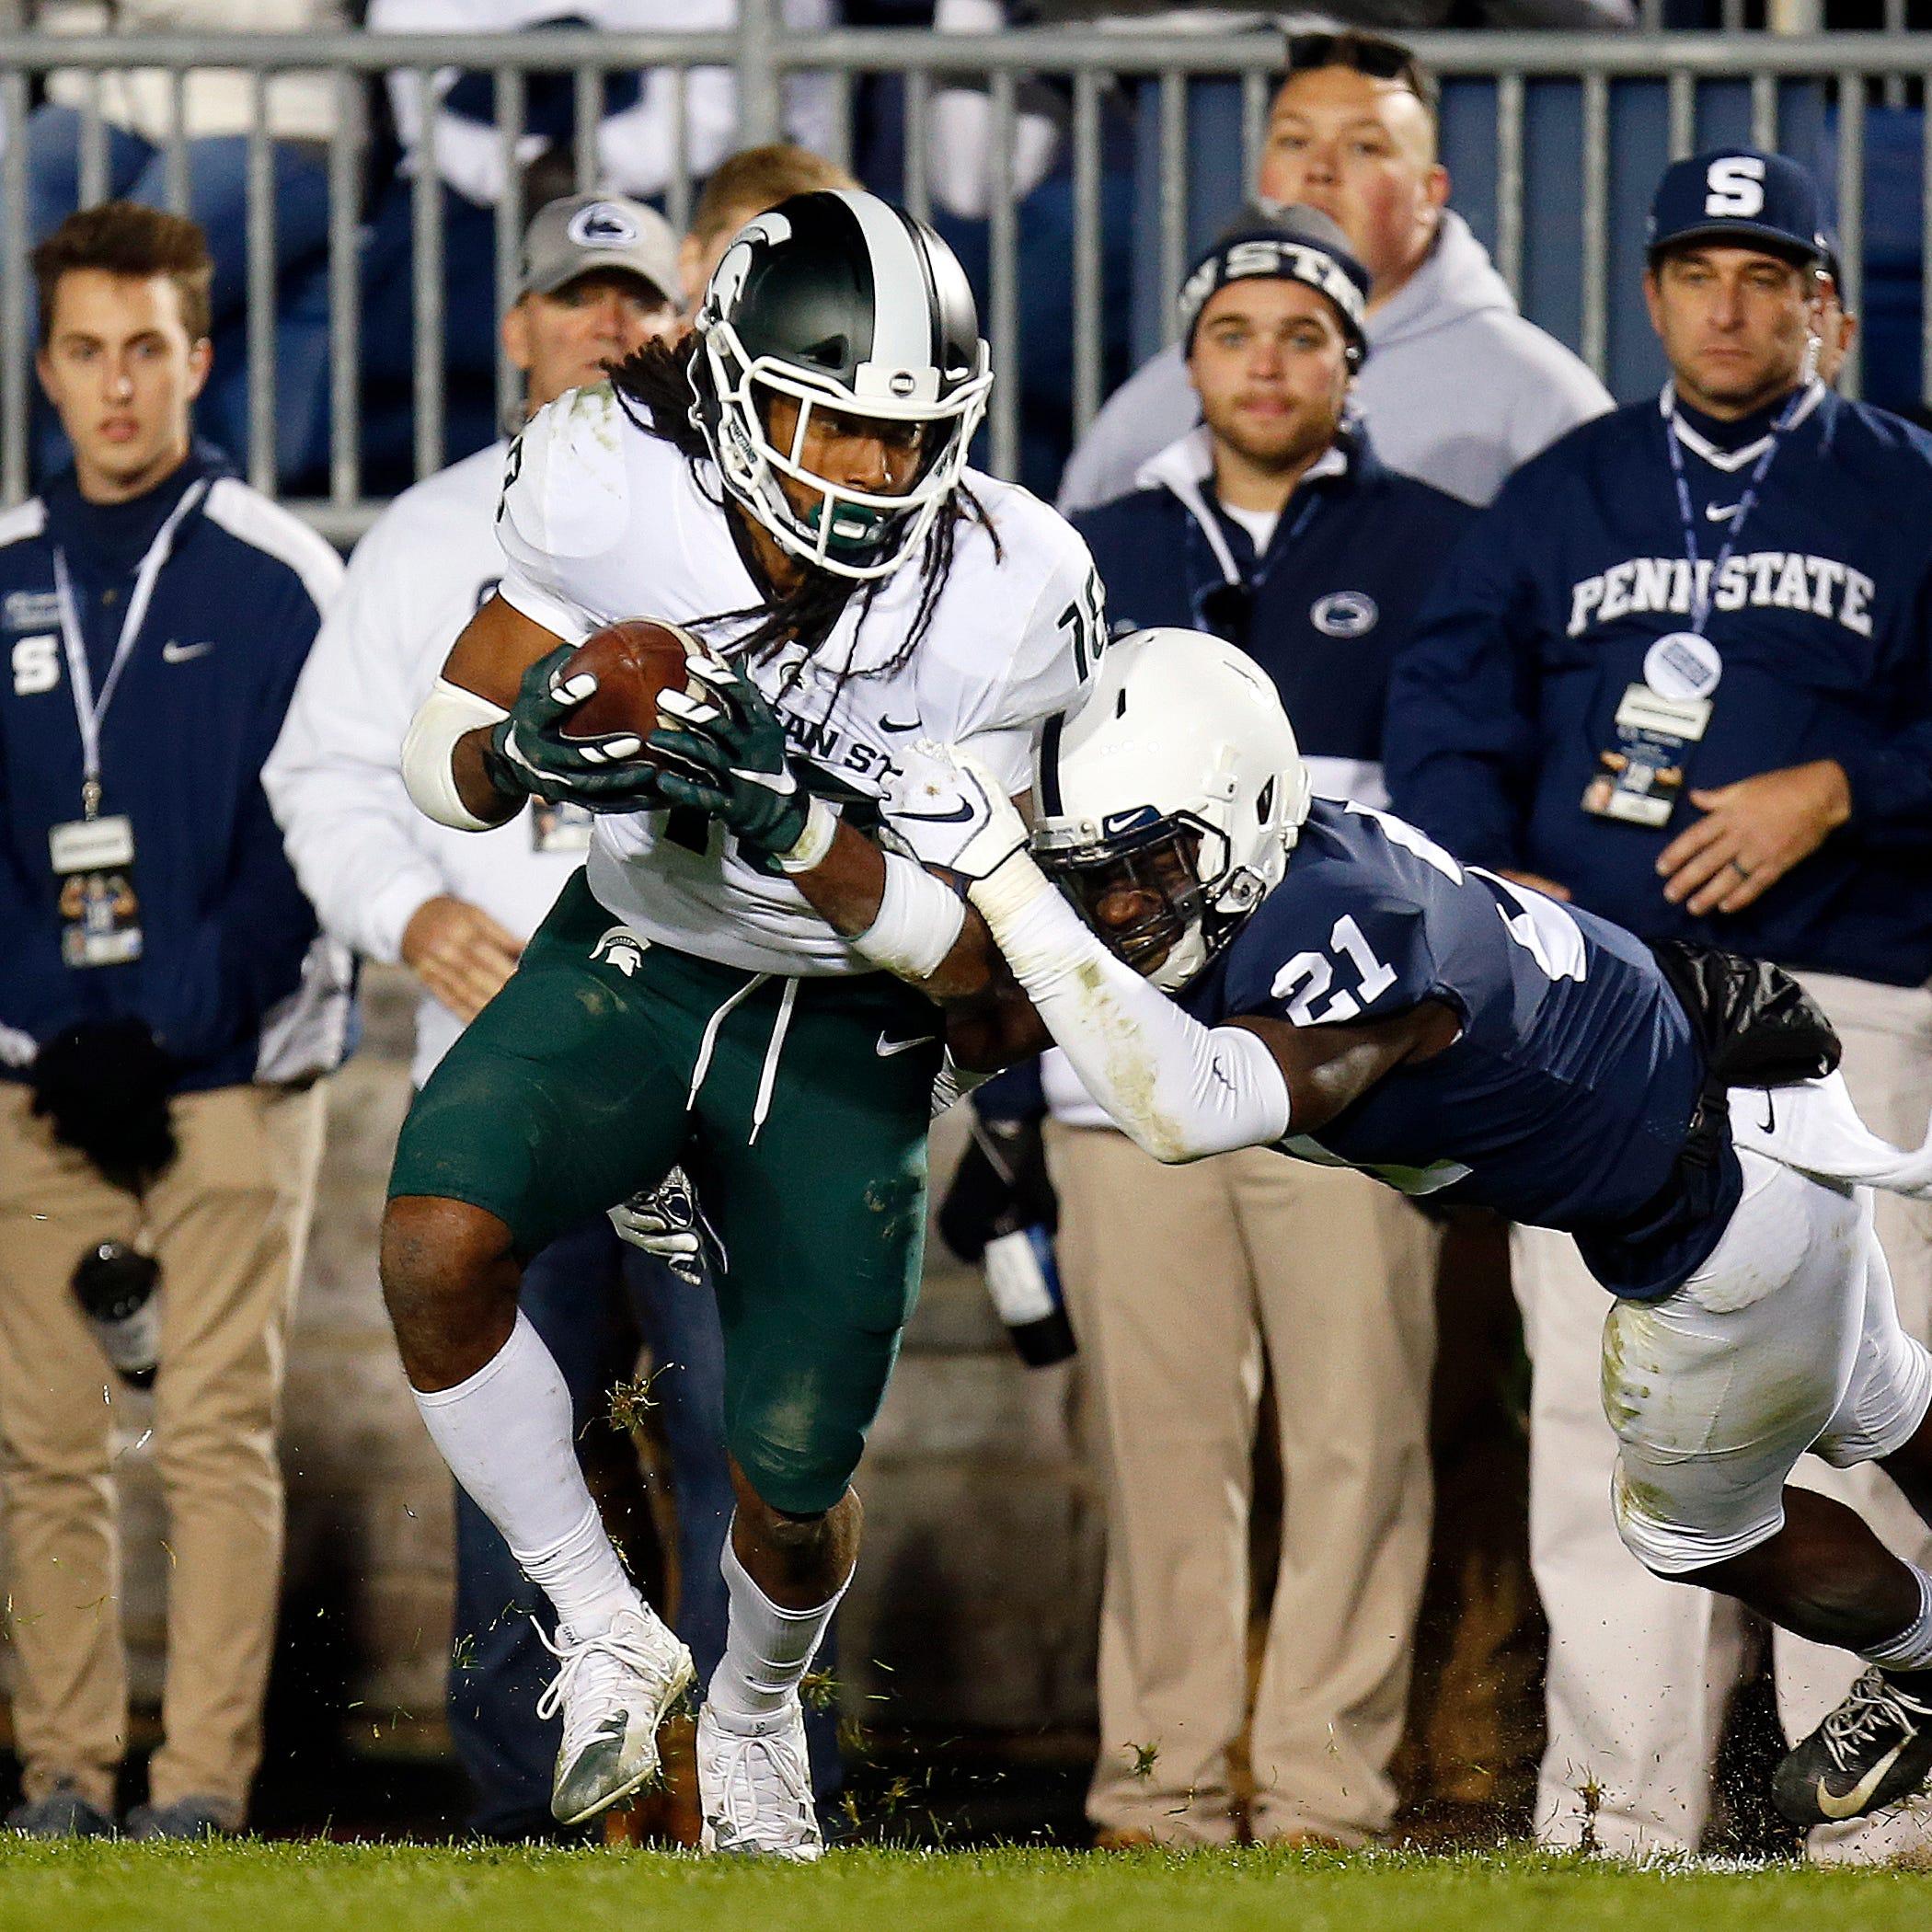 Grading Detroit Lions' 5th-round pick: Penn State CB Amani Oruwariye